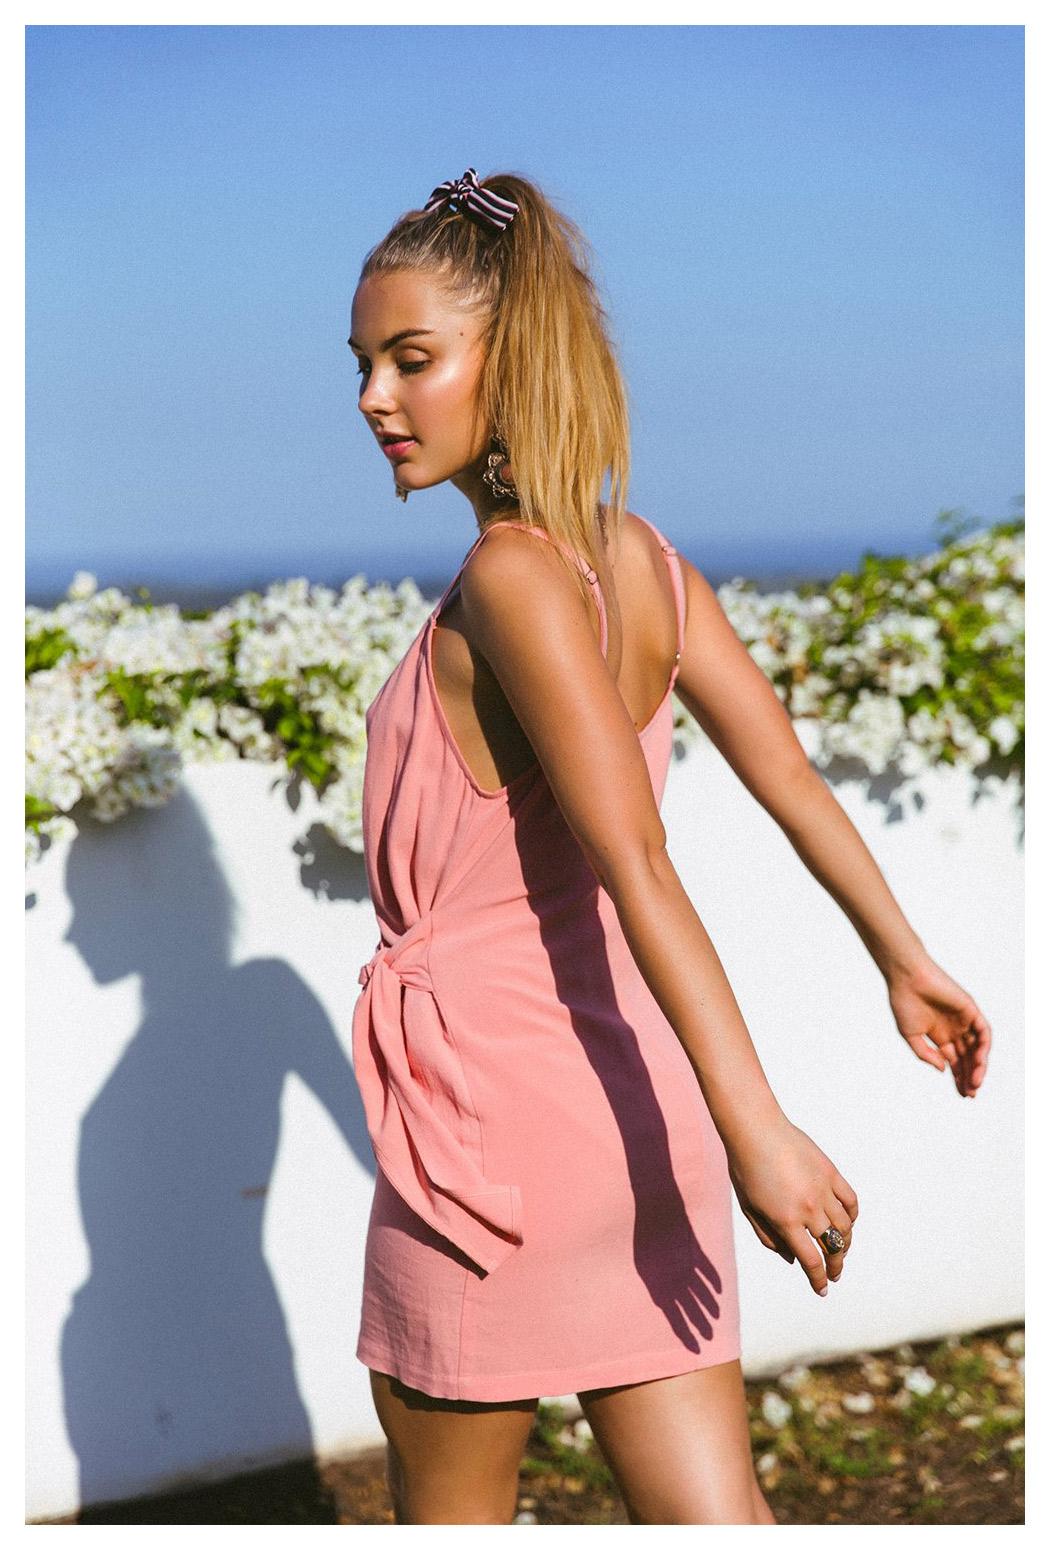 Le_Salty_Label_Azalea_Mini_Dress_Blossom_2.jpg